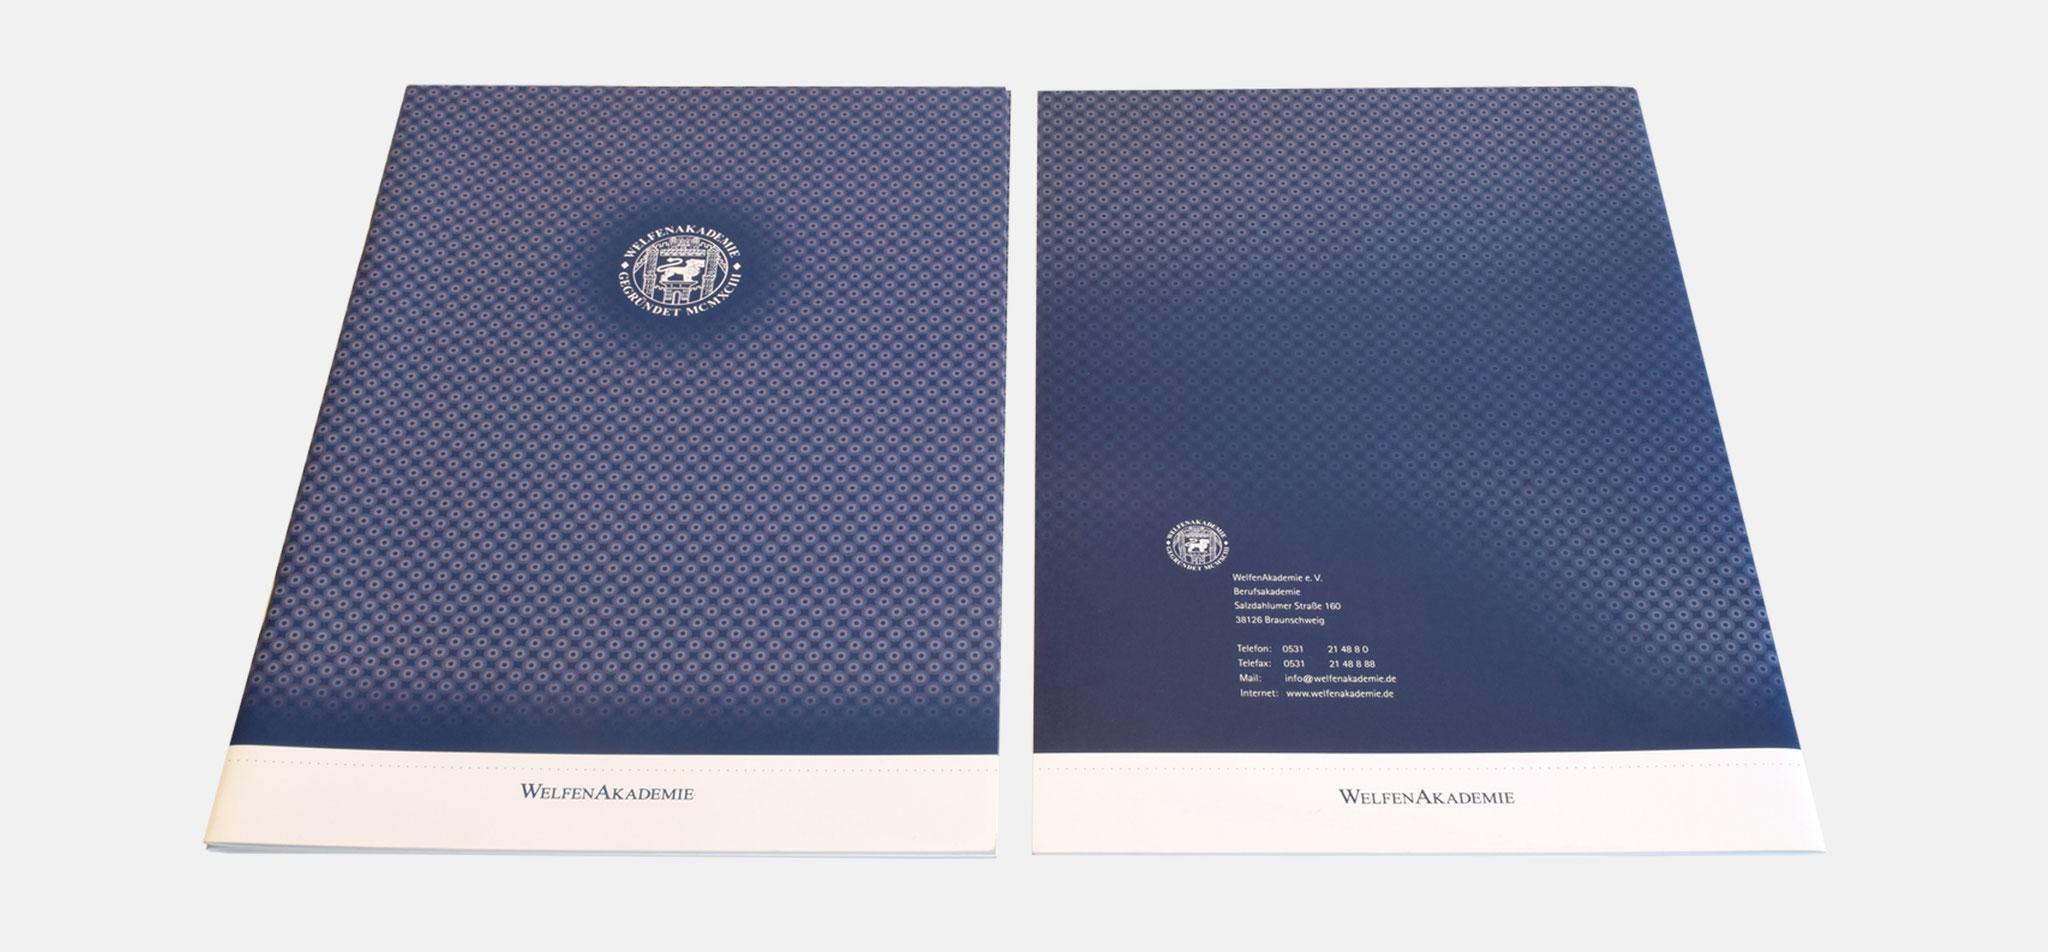 WELFENAKADEMIE | corporate design – infragrau, gute gestaltung